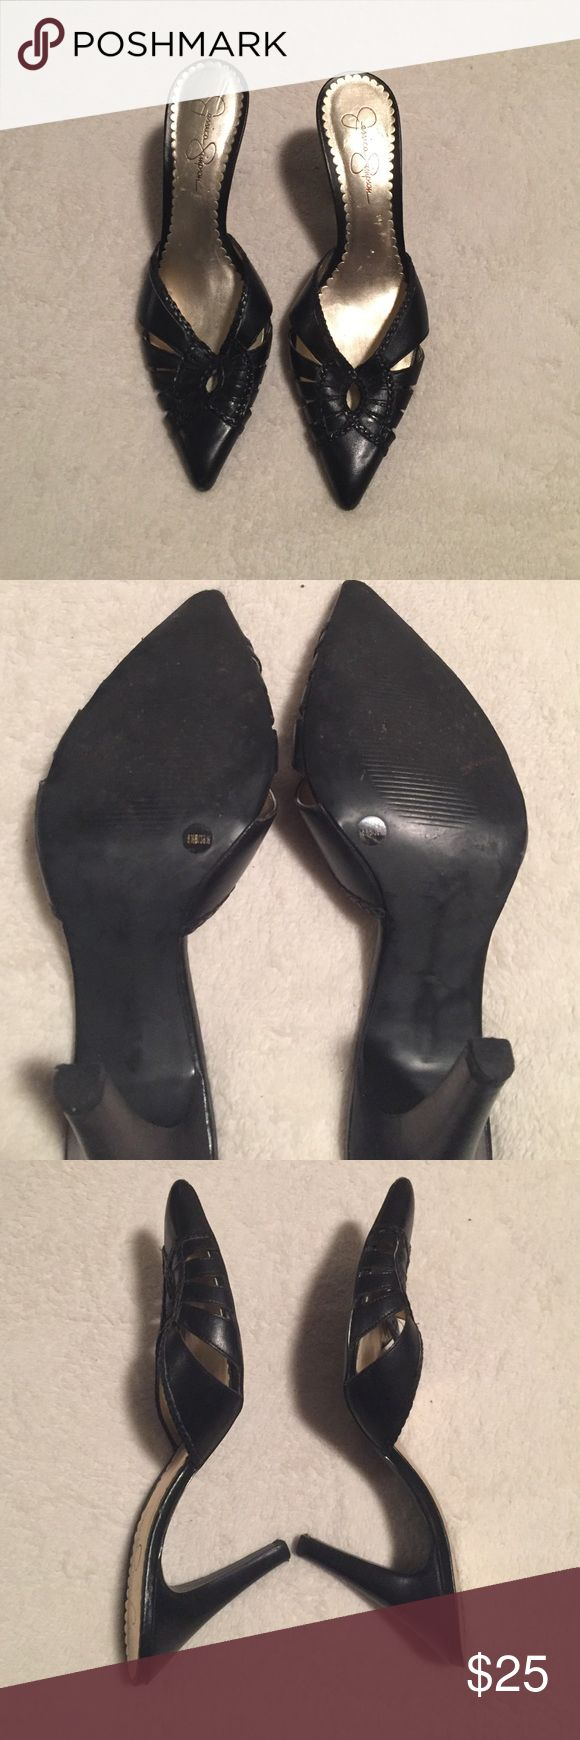 4 inch black Jessica Simpson heels 4 inch black Jessica Simpson heels Jessica Simpson Shoes Heels